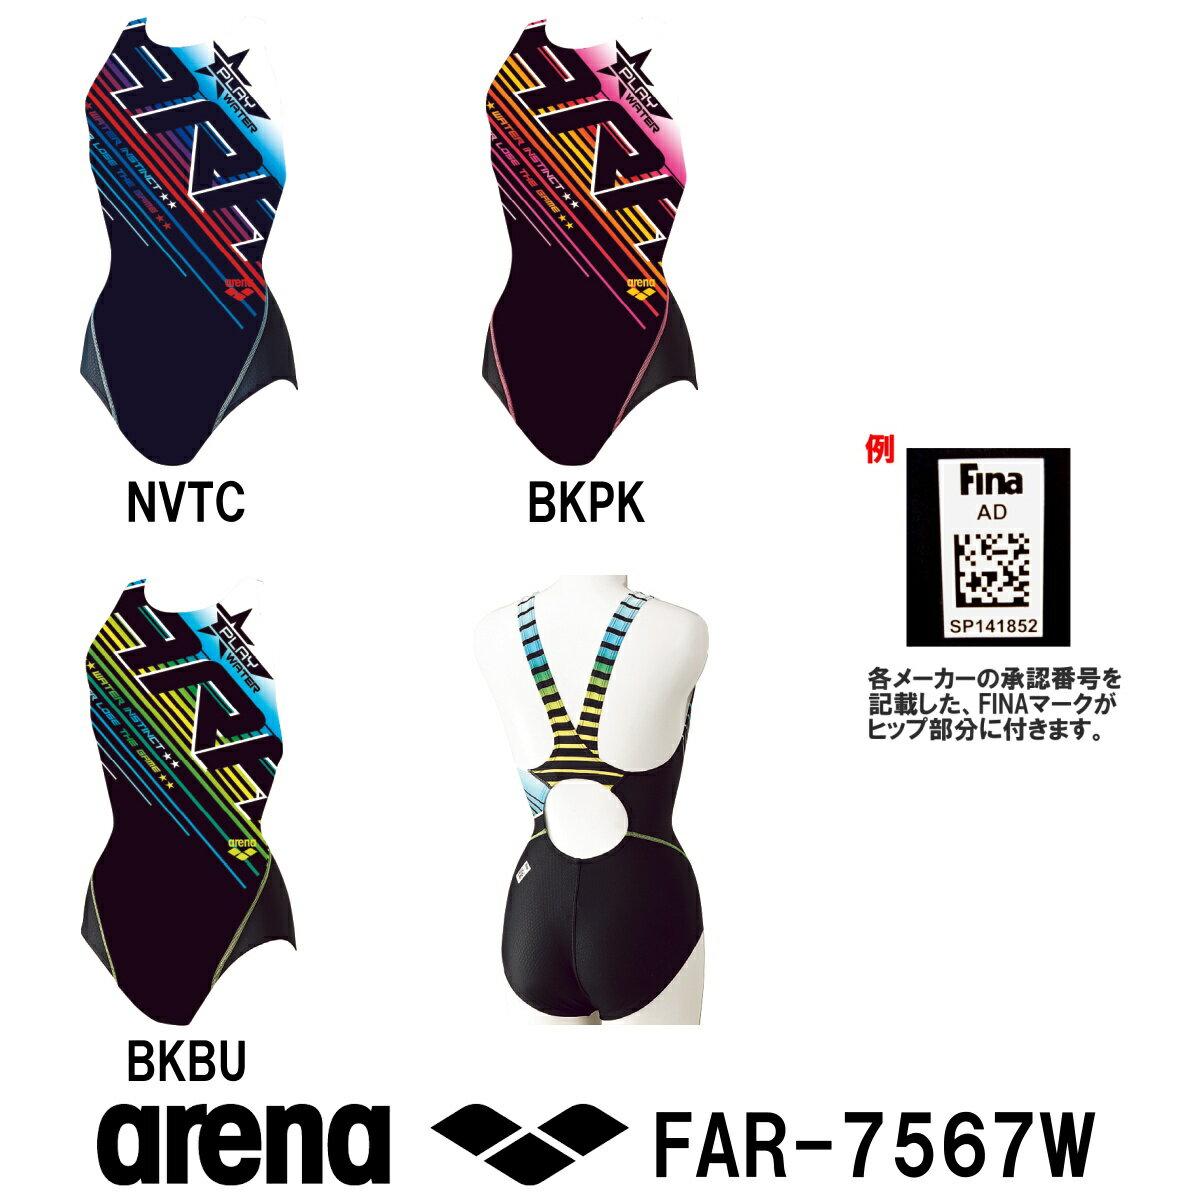 【FAR-7567W】ARENA(アリーナ)レディース競泳水着UROKOSKINセーフリーバック(着やストラップ)